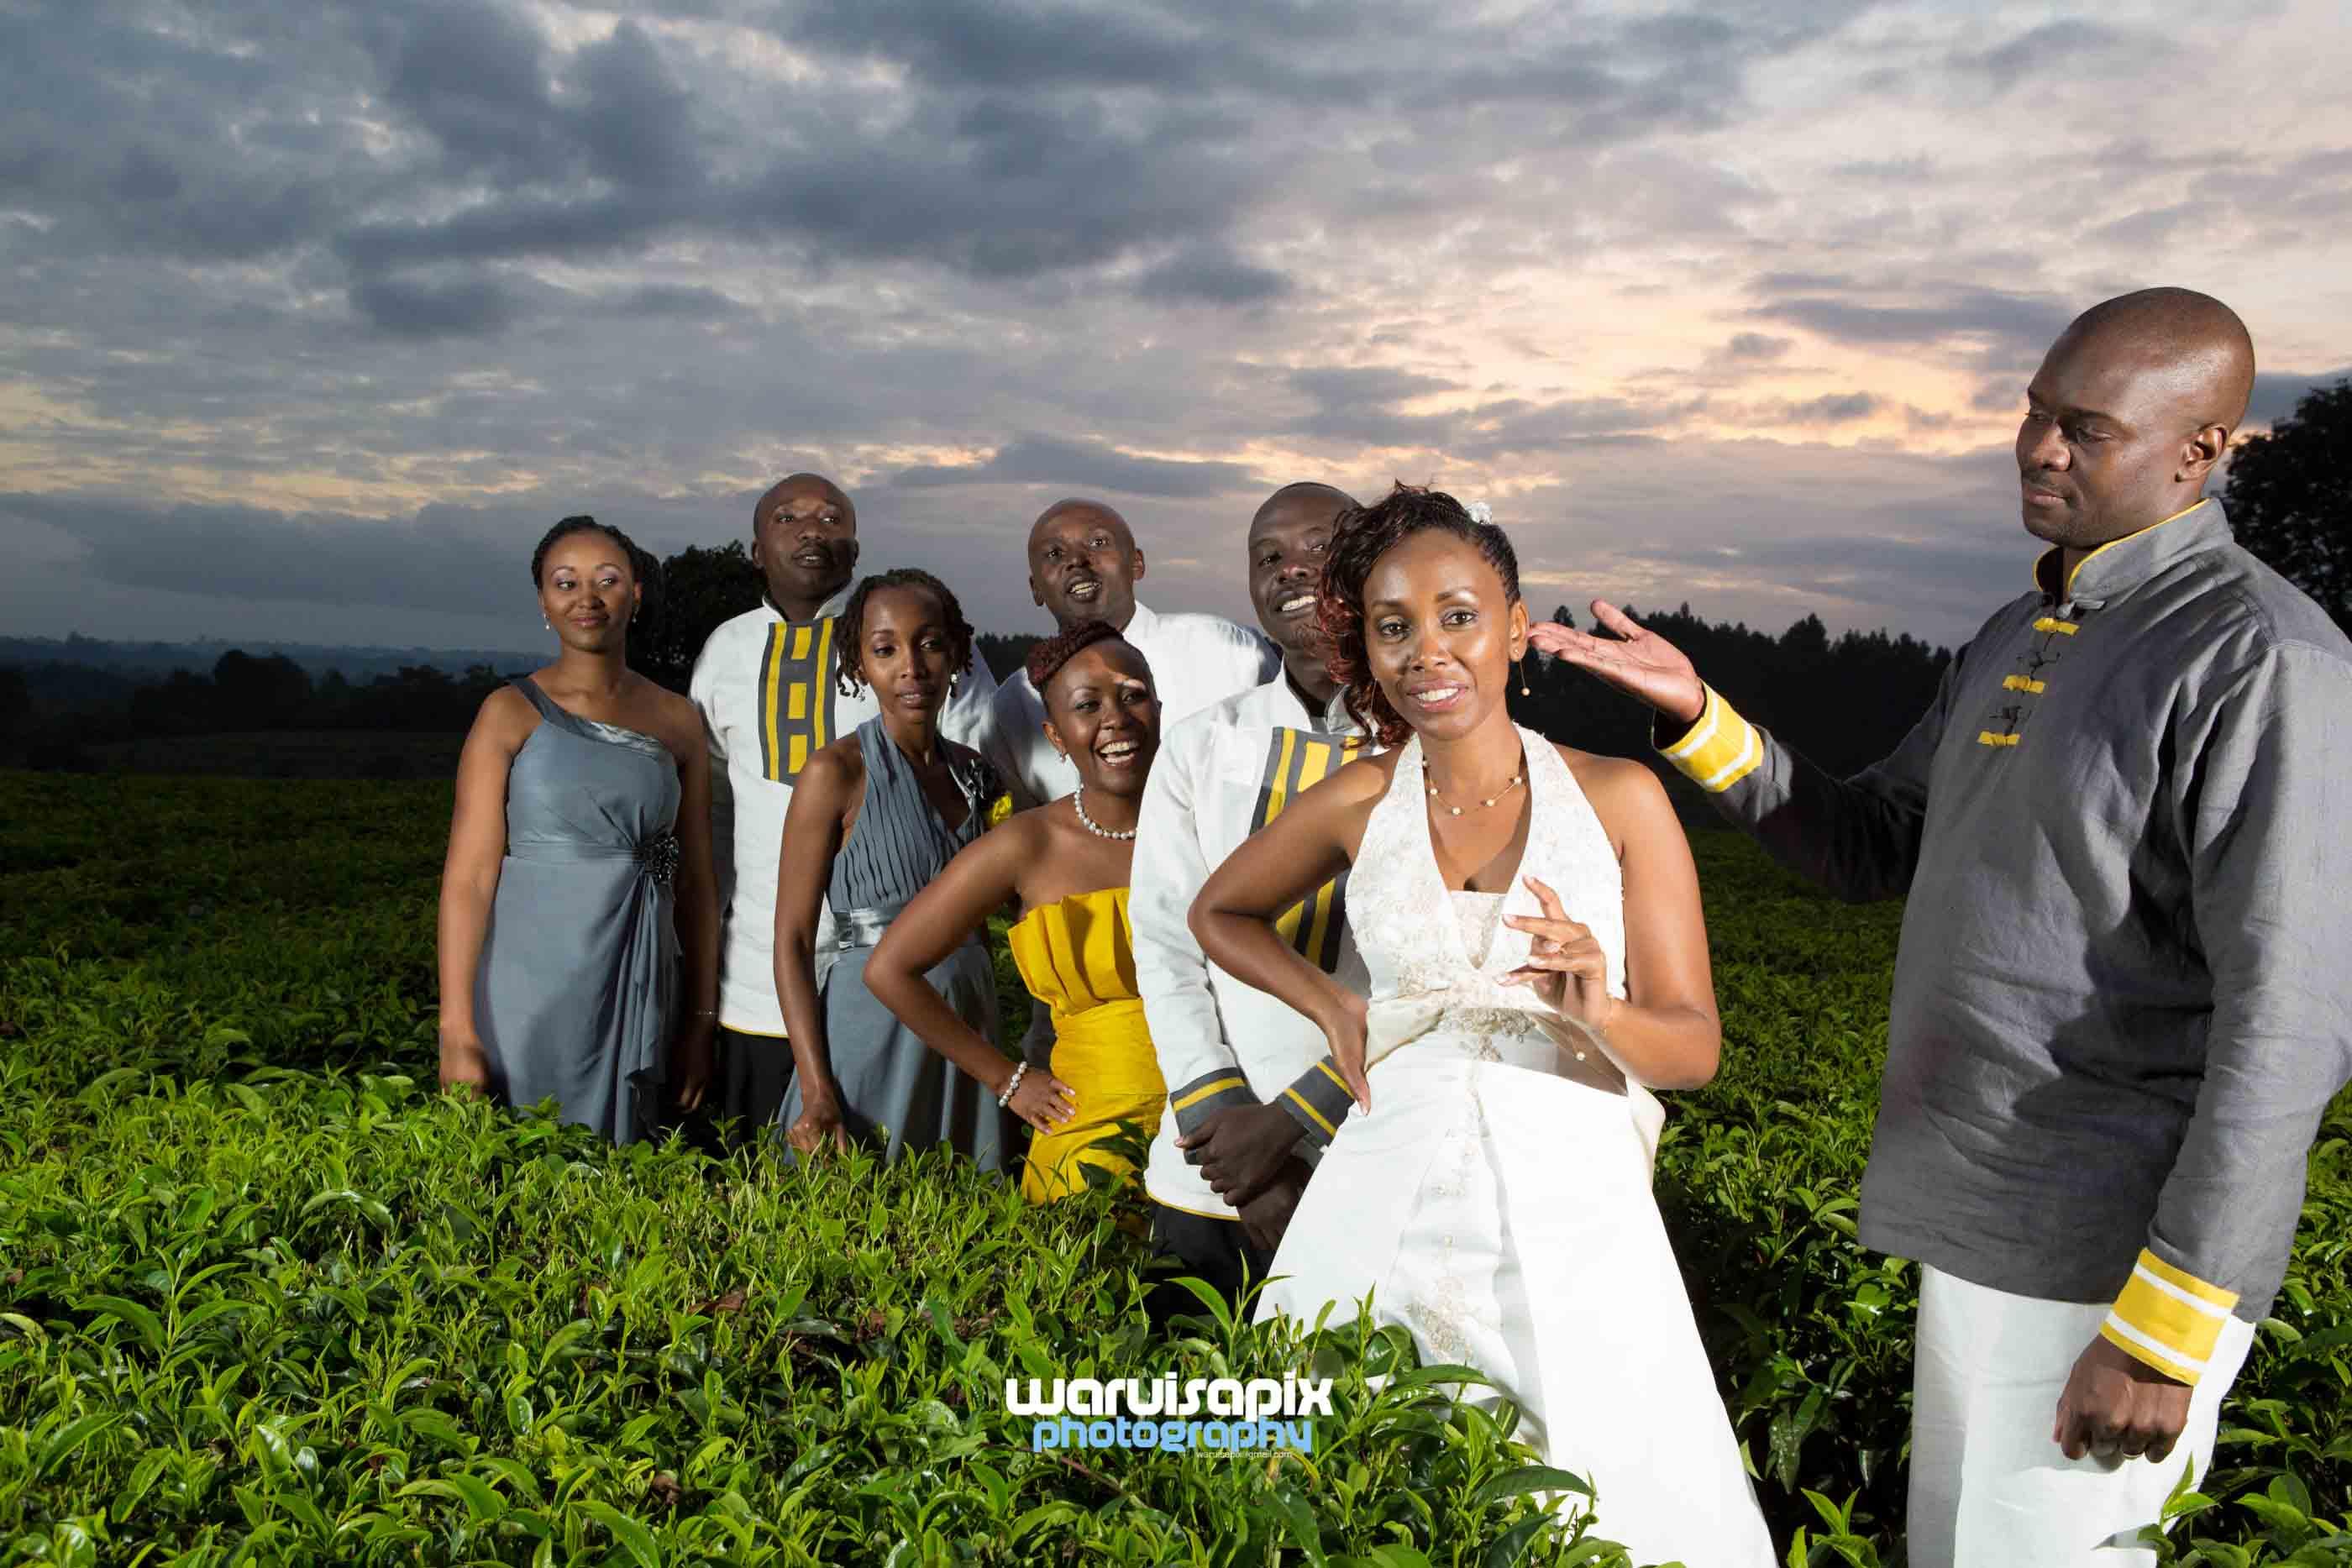 Kibunja wedding hairstyles